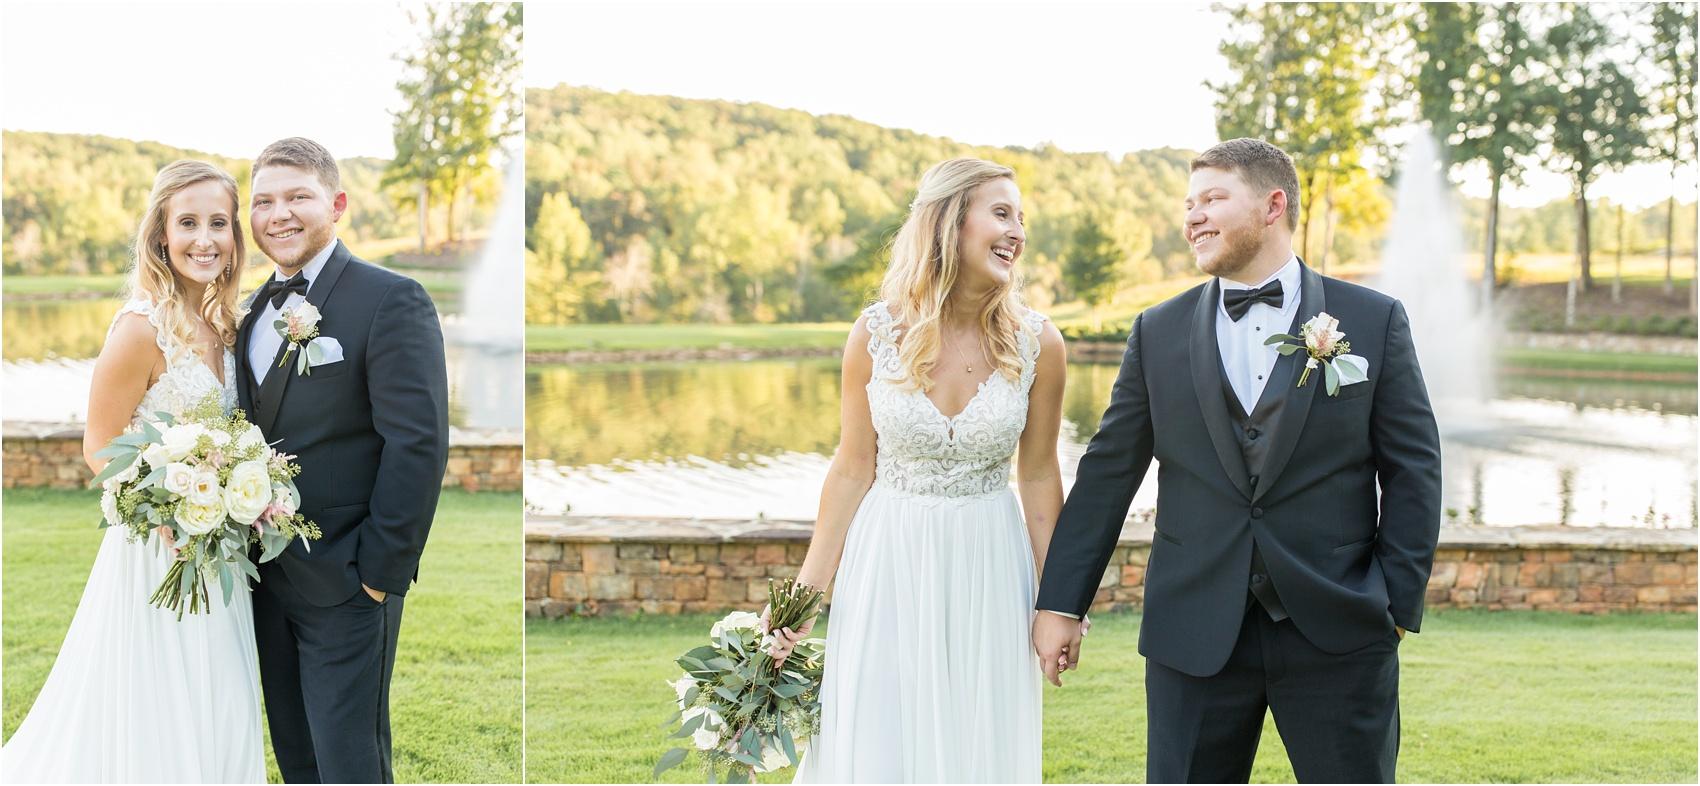 Savannah Eve Photography- Jurek-Woodworth Wedding- Sneak Peek-66.jpg